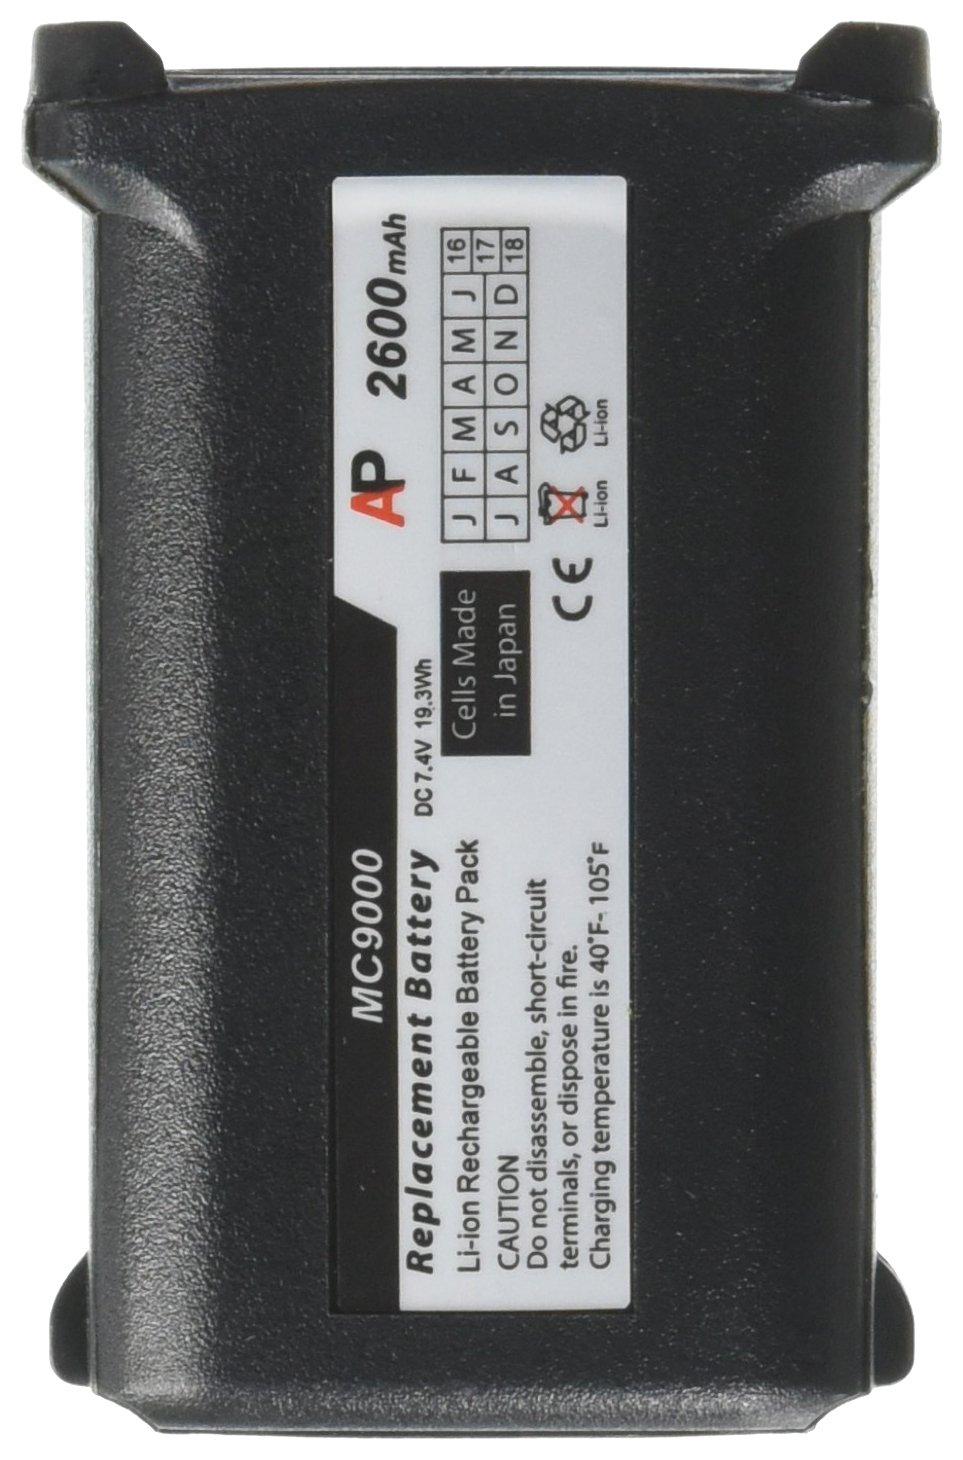 Motorola/Symbol MC9000-G/K Series Scanners: Replacement Battery. 2600 mAh Artisan Power 9060 9090 9097